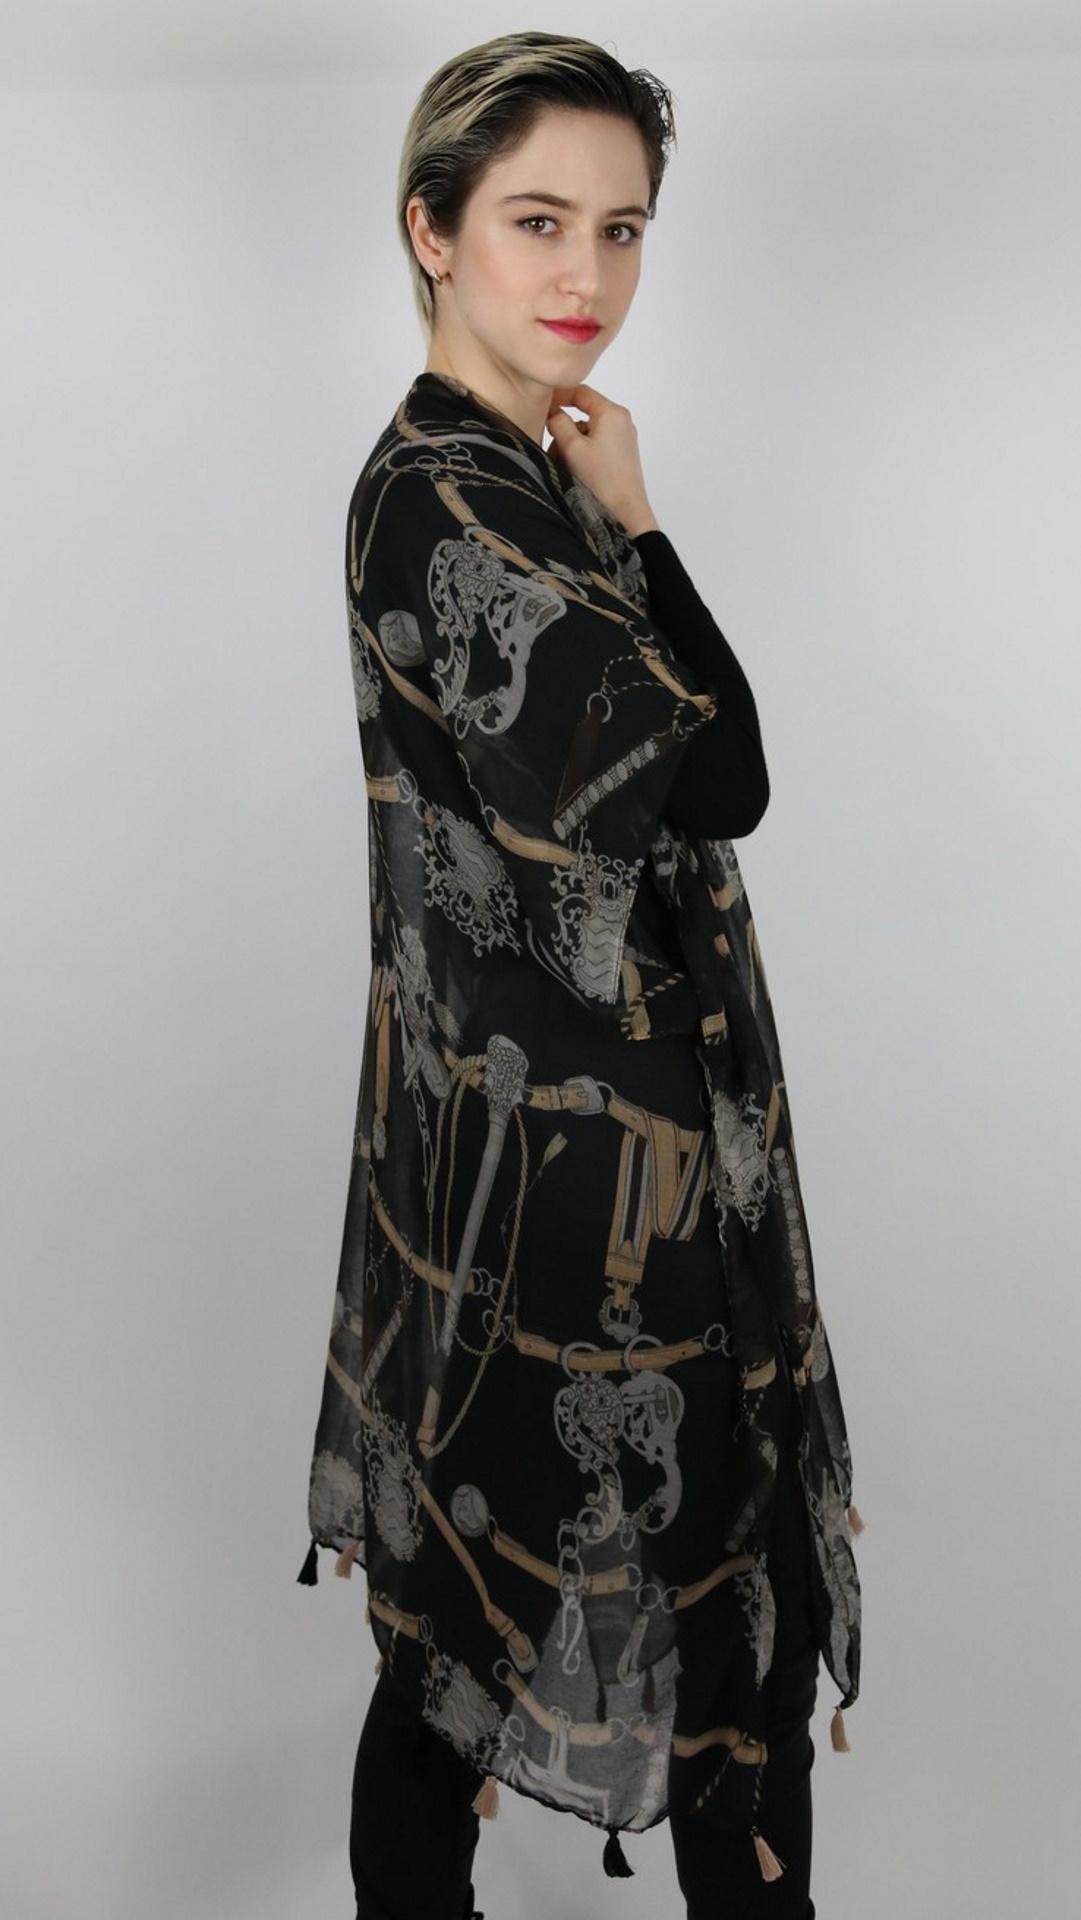 CLOTHES08 STOLA DONNA FOULARD CARDIGAN COPRISPALLE 3 1stAmerican elegante stola da donna foulard cardigan coprispalle